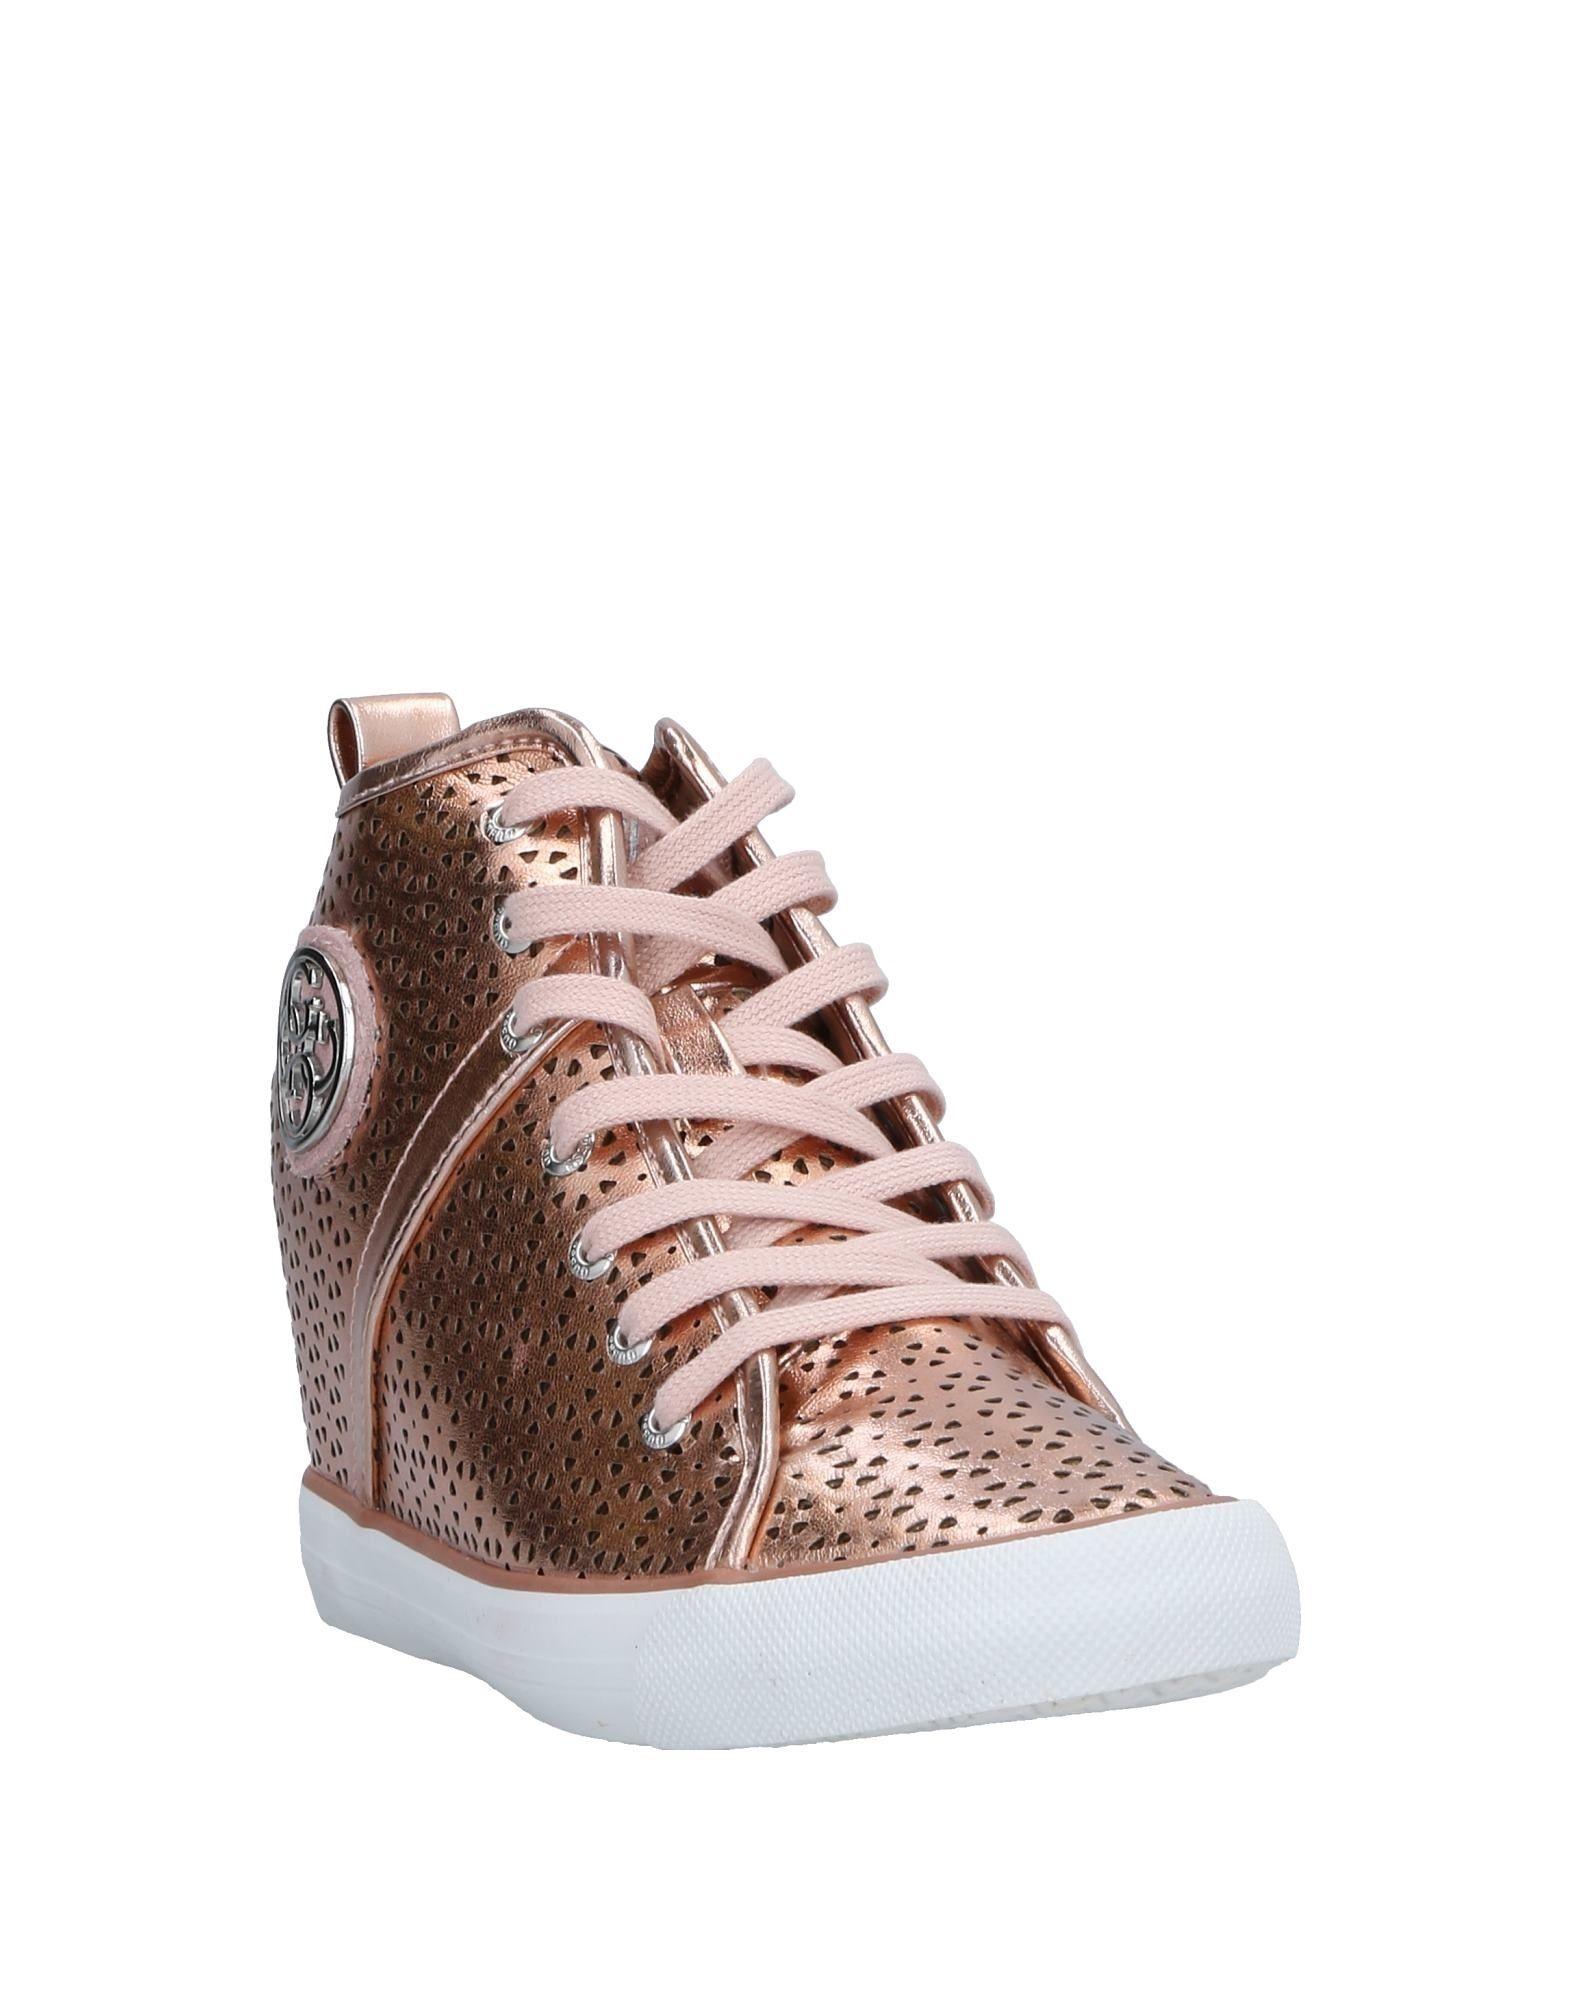 11521053HO Guess Sneakers Damen  11521053HO  a64fd4